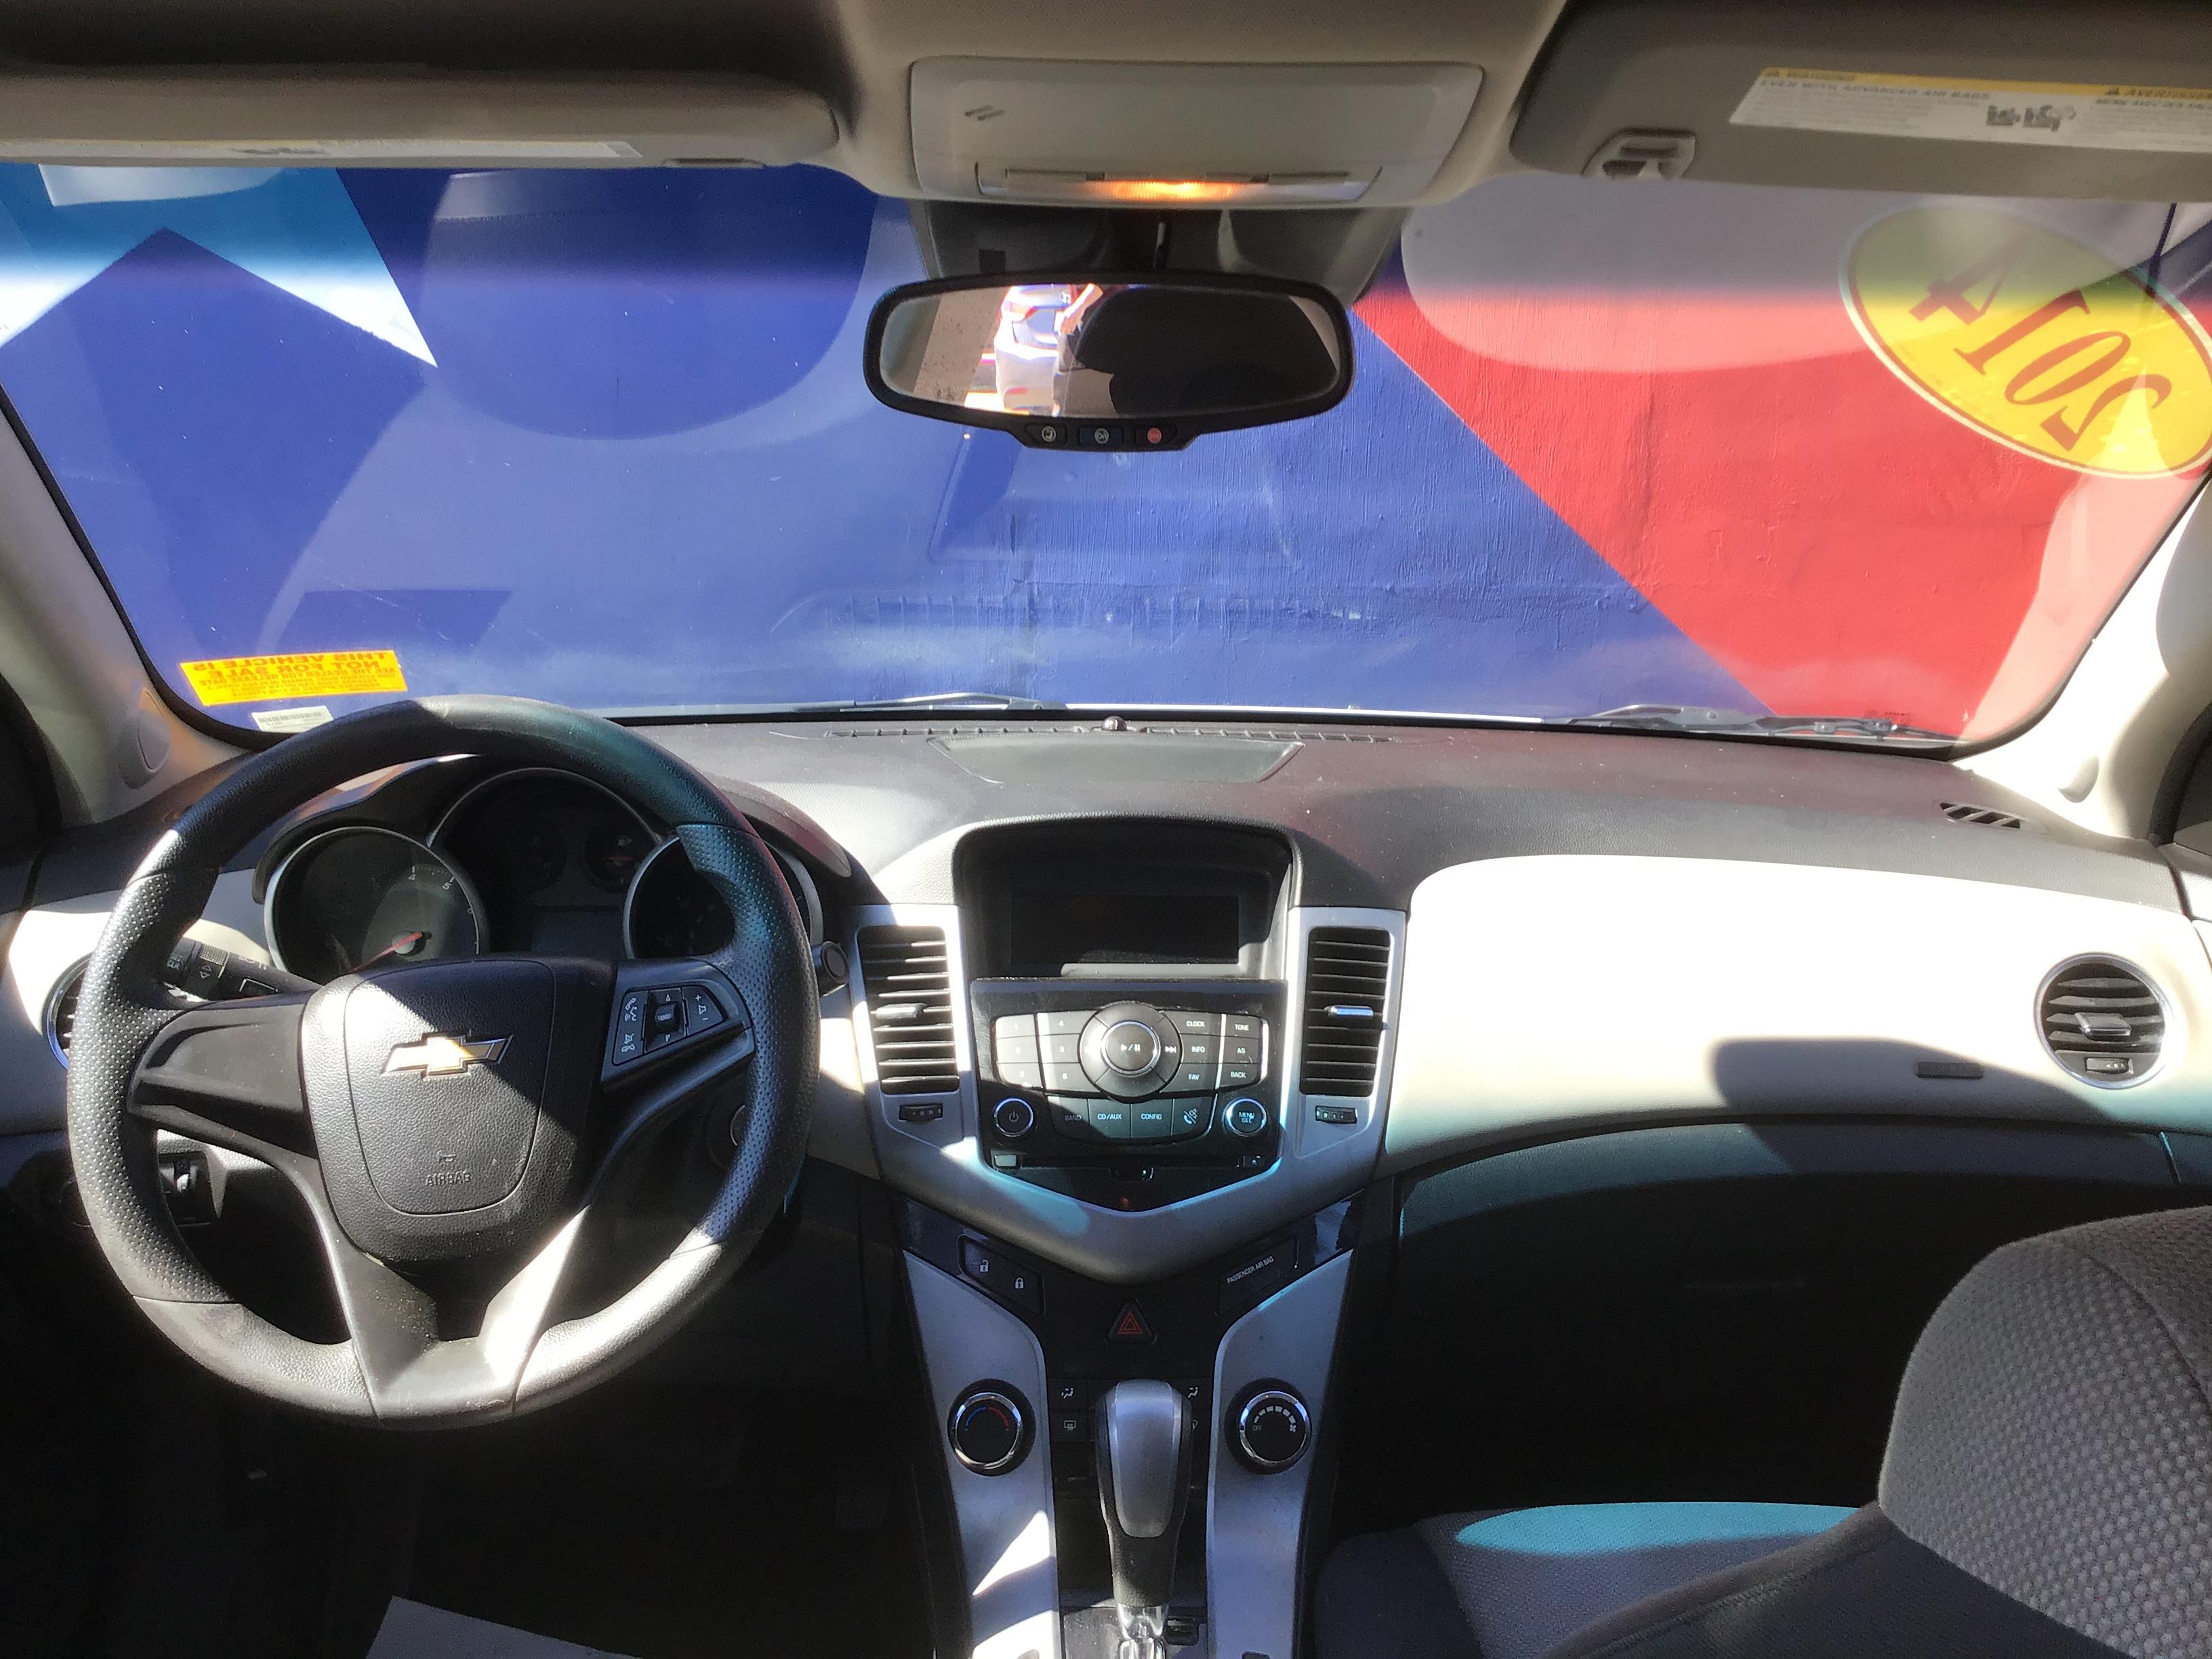 used vehicle - Automatic CHEVROLET CRUZE 2014